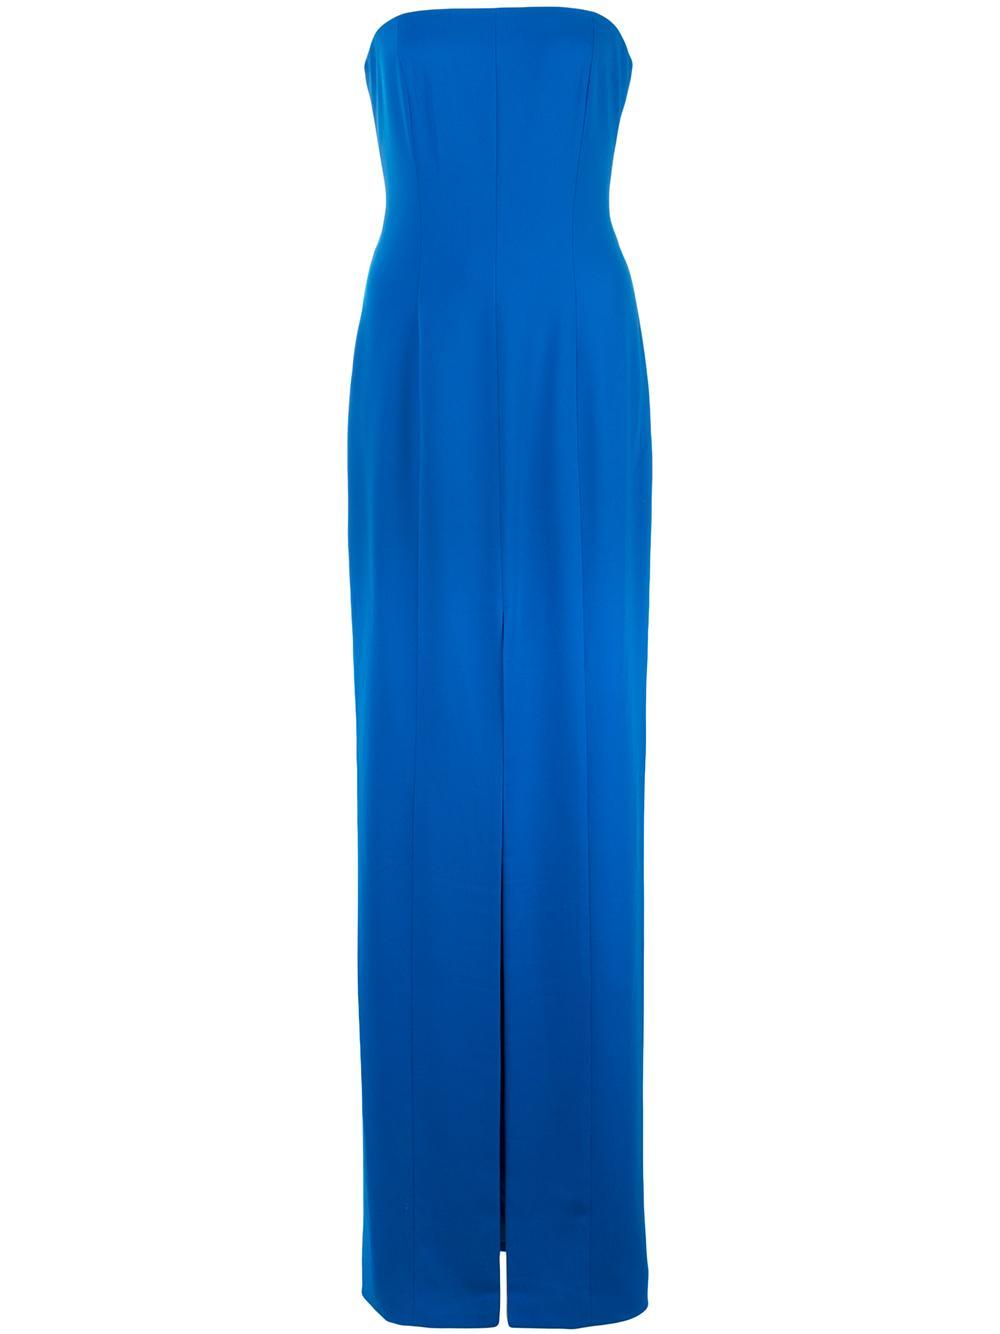 Martell Strapless Slit Gown